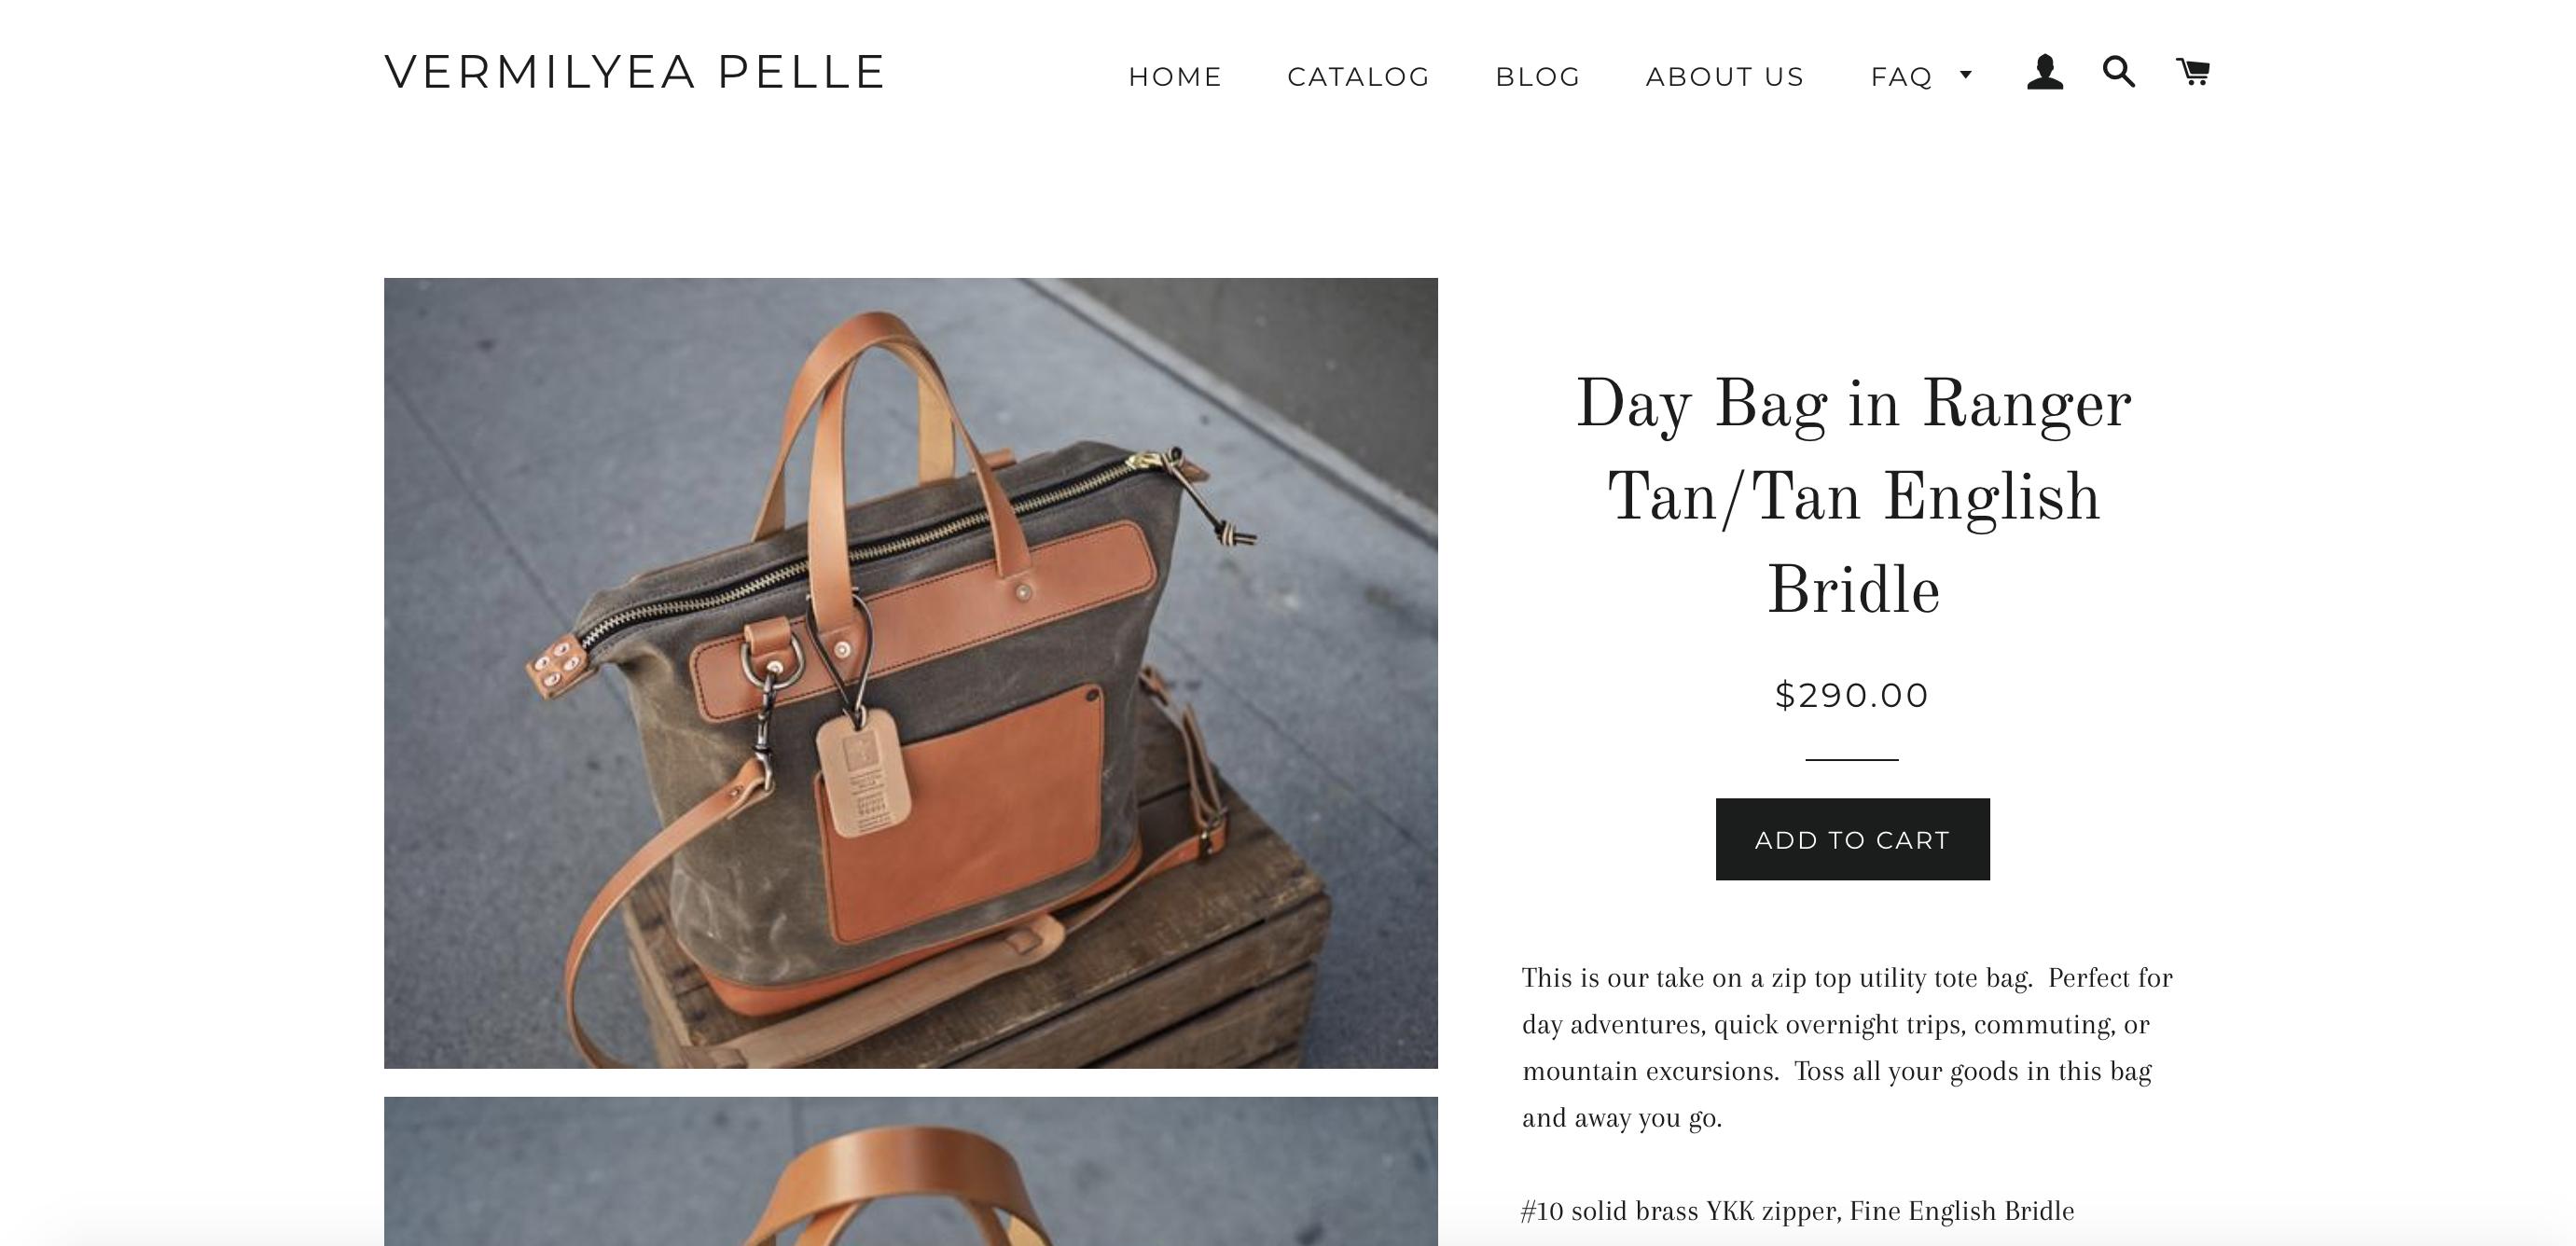 product page optimization - Vermilyea Pelle